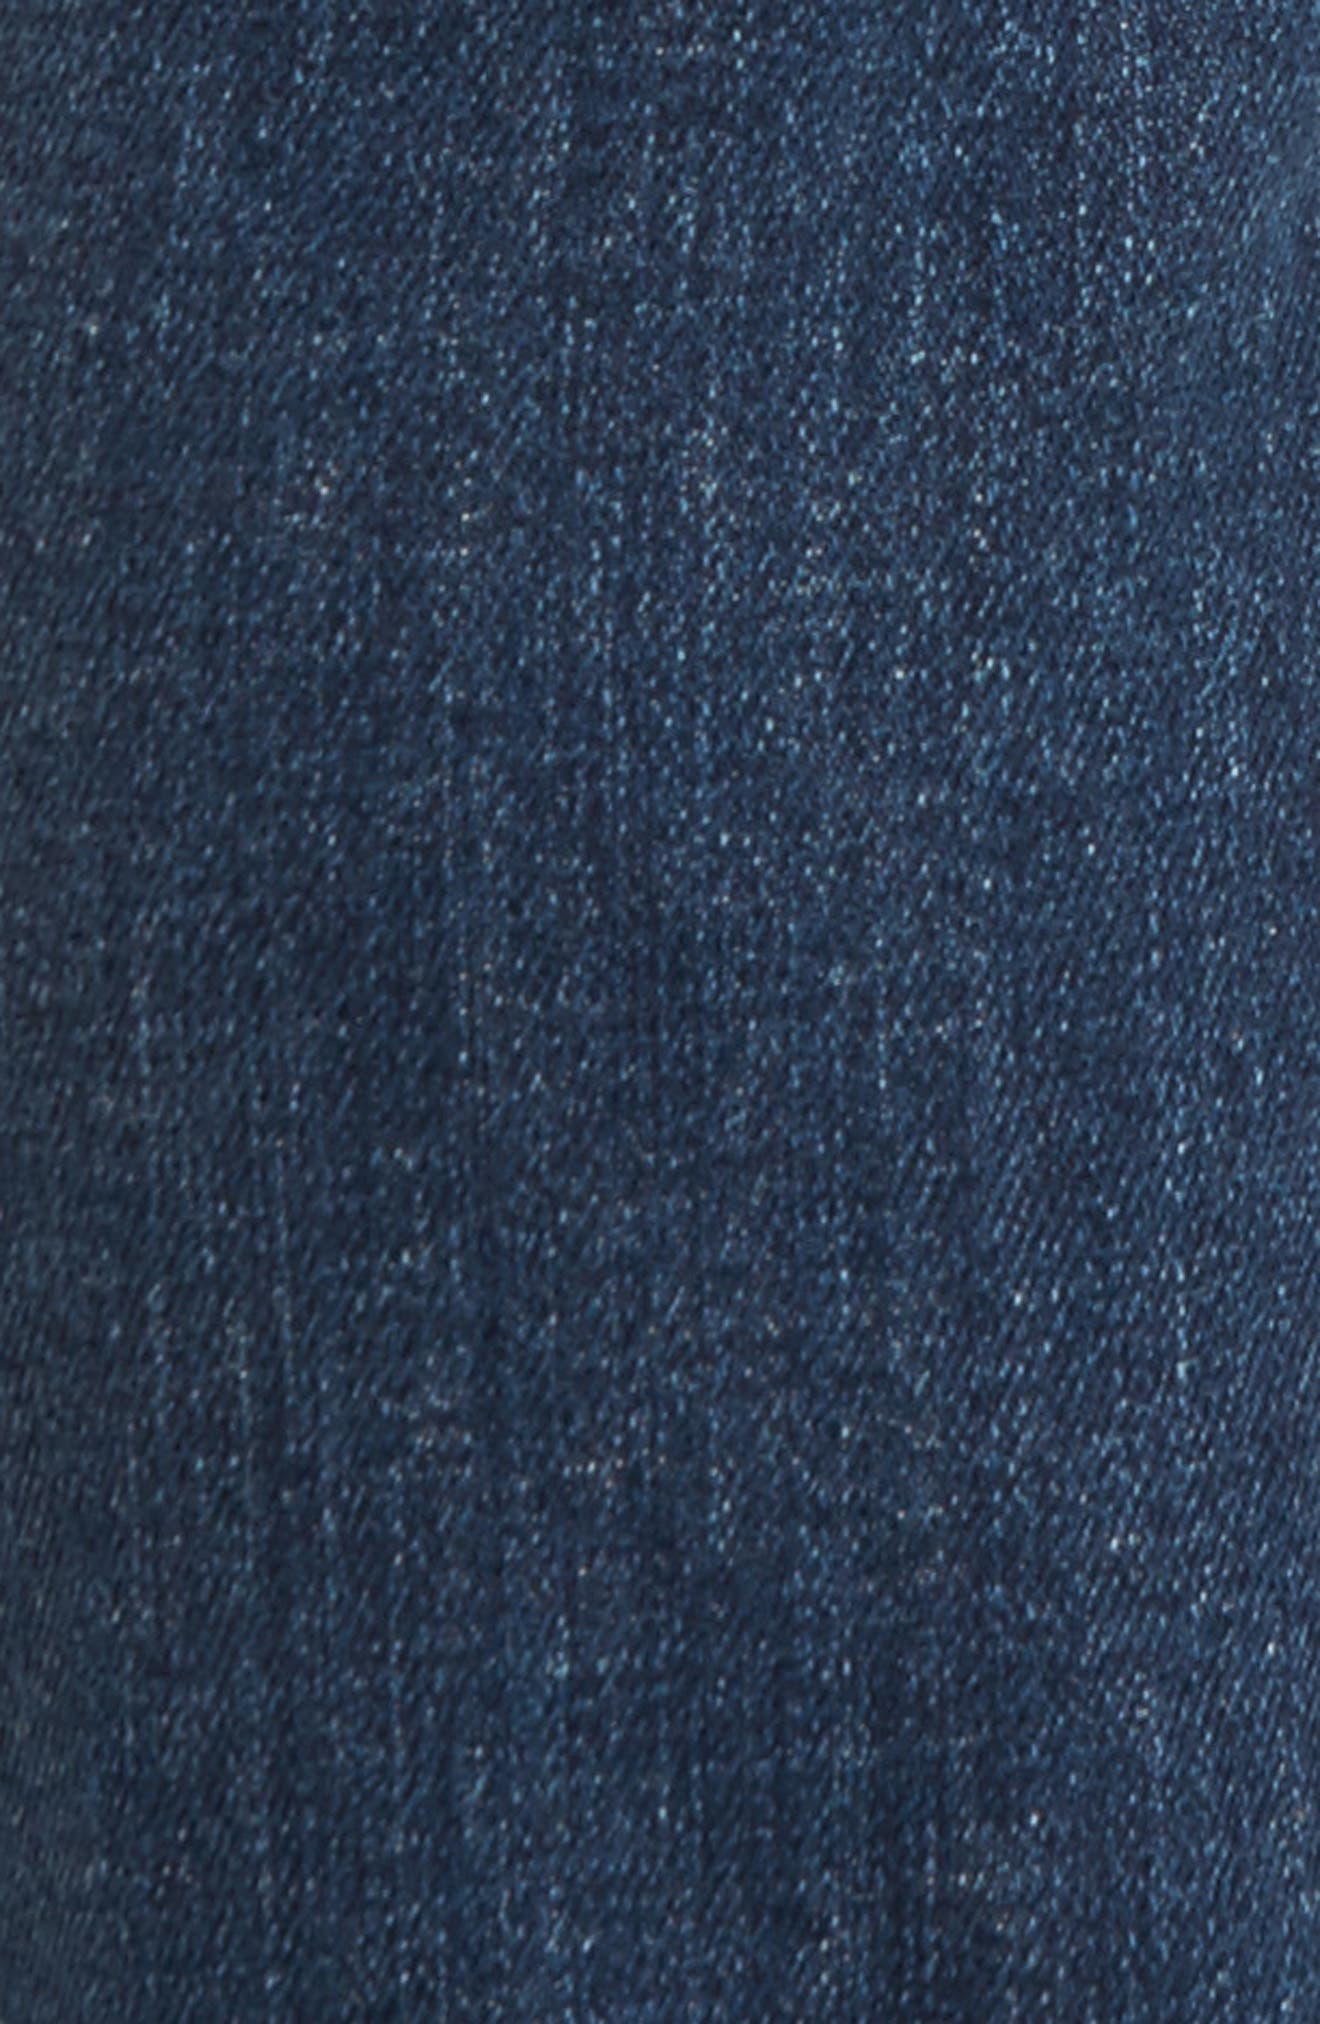 L'Homme Skinny Fit Jeans,                             Alternate thumbnail 5, color,                             405